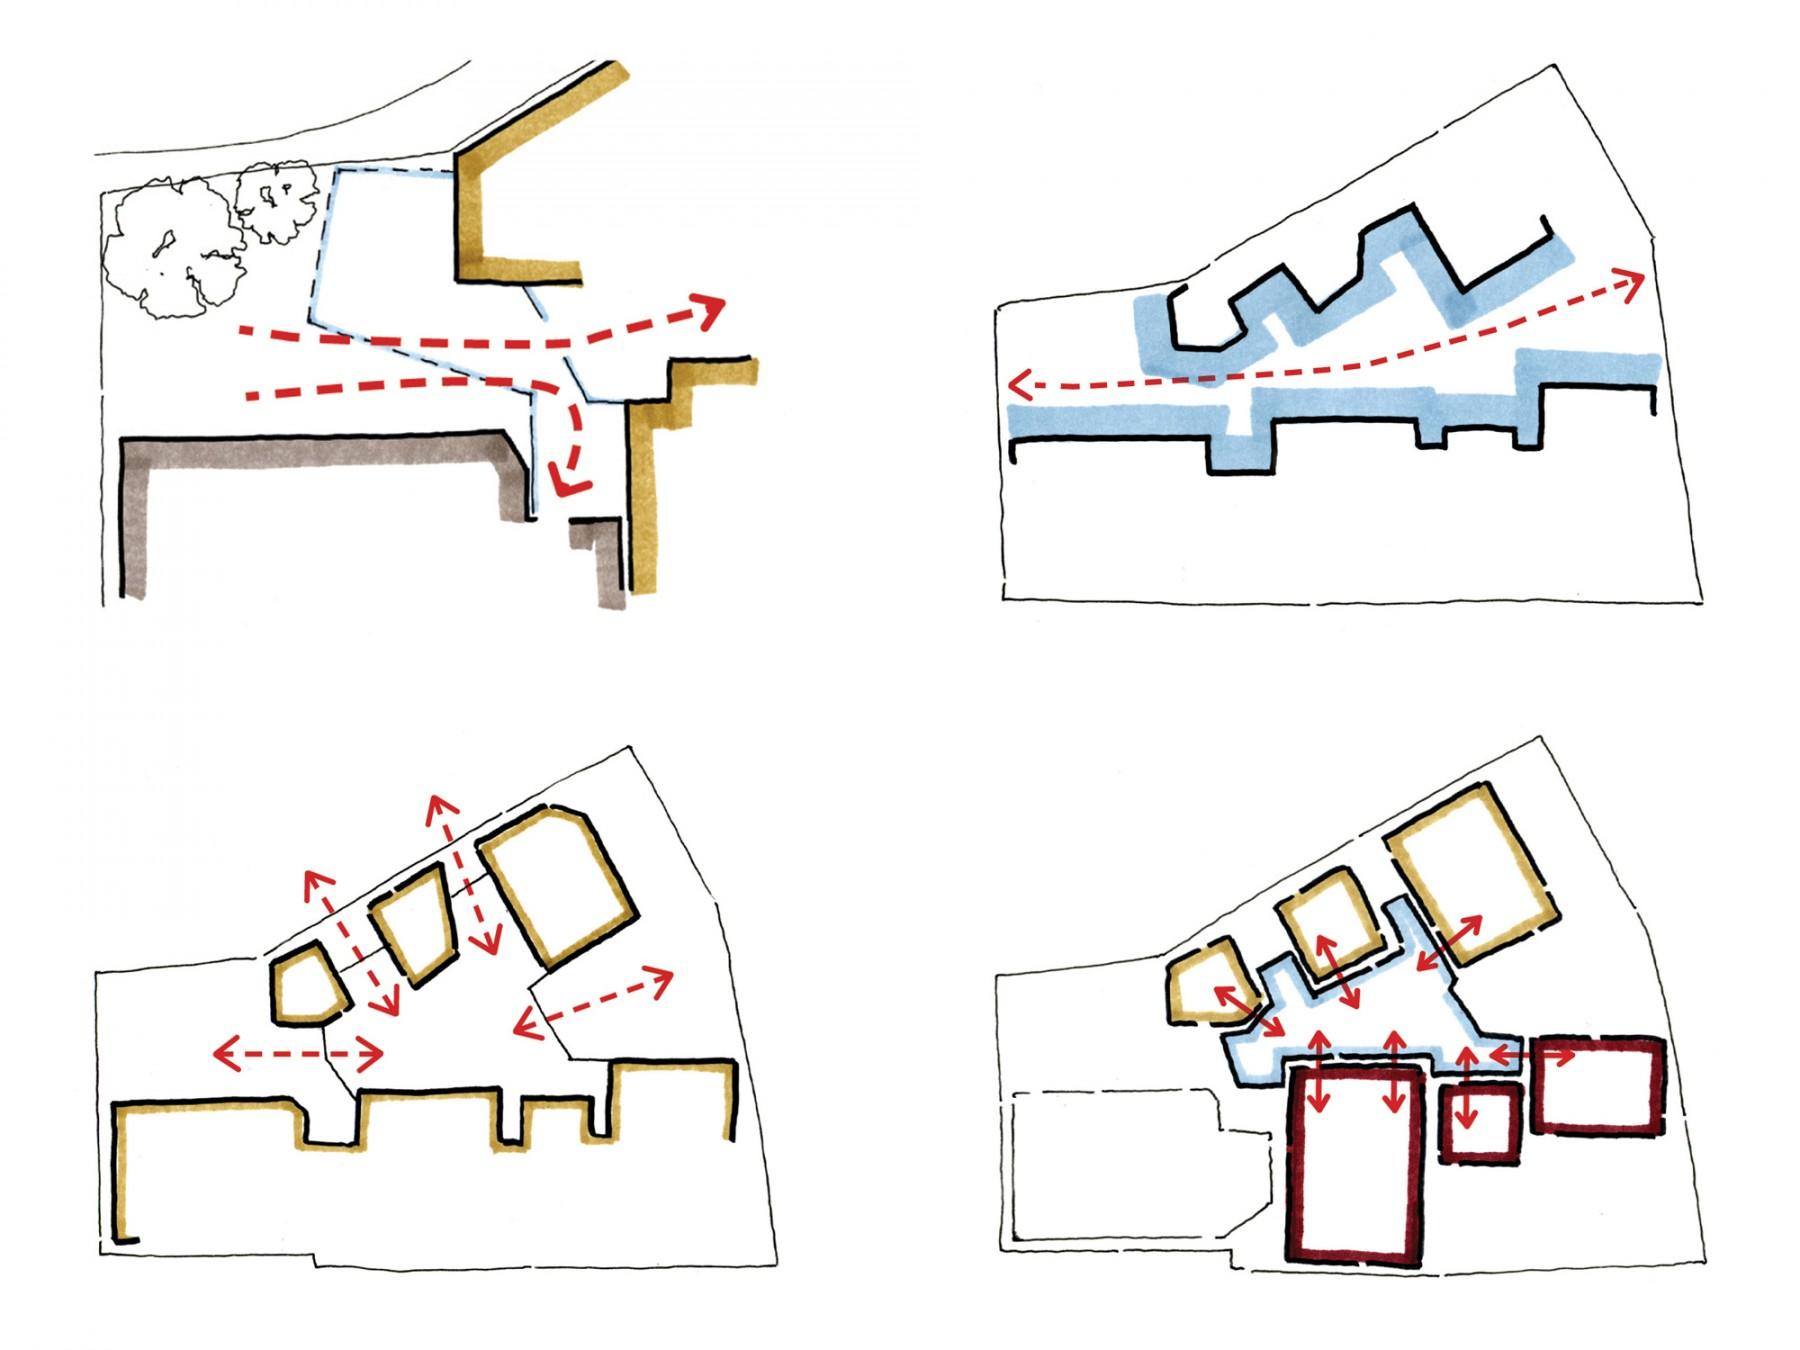 University-Bath-Creative-Arts-Centre-short-list-education-somerset-campus-theatre-Jamie-Fobert-architects-sketches